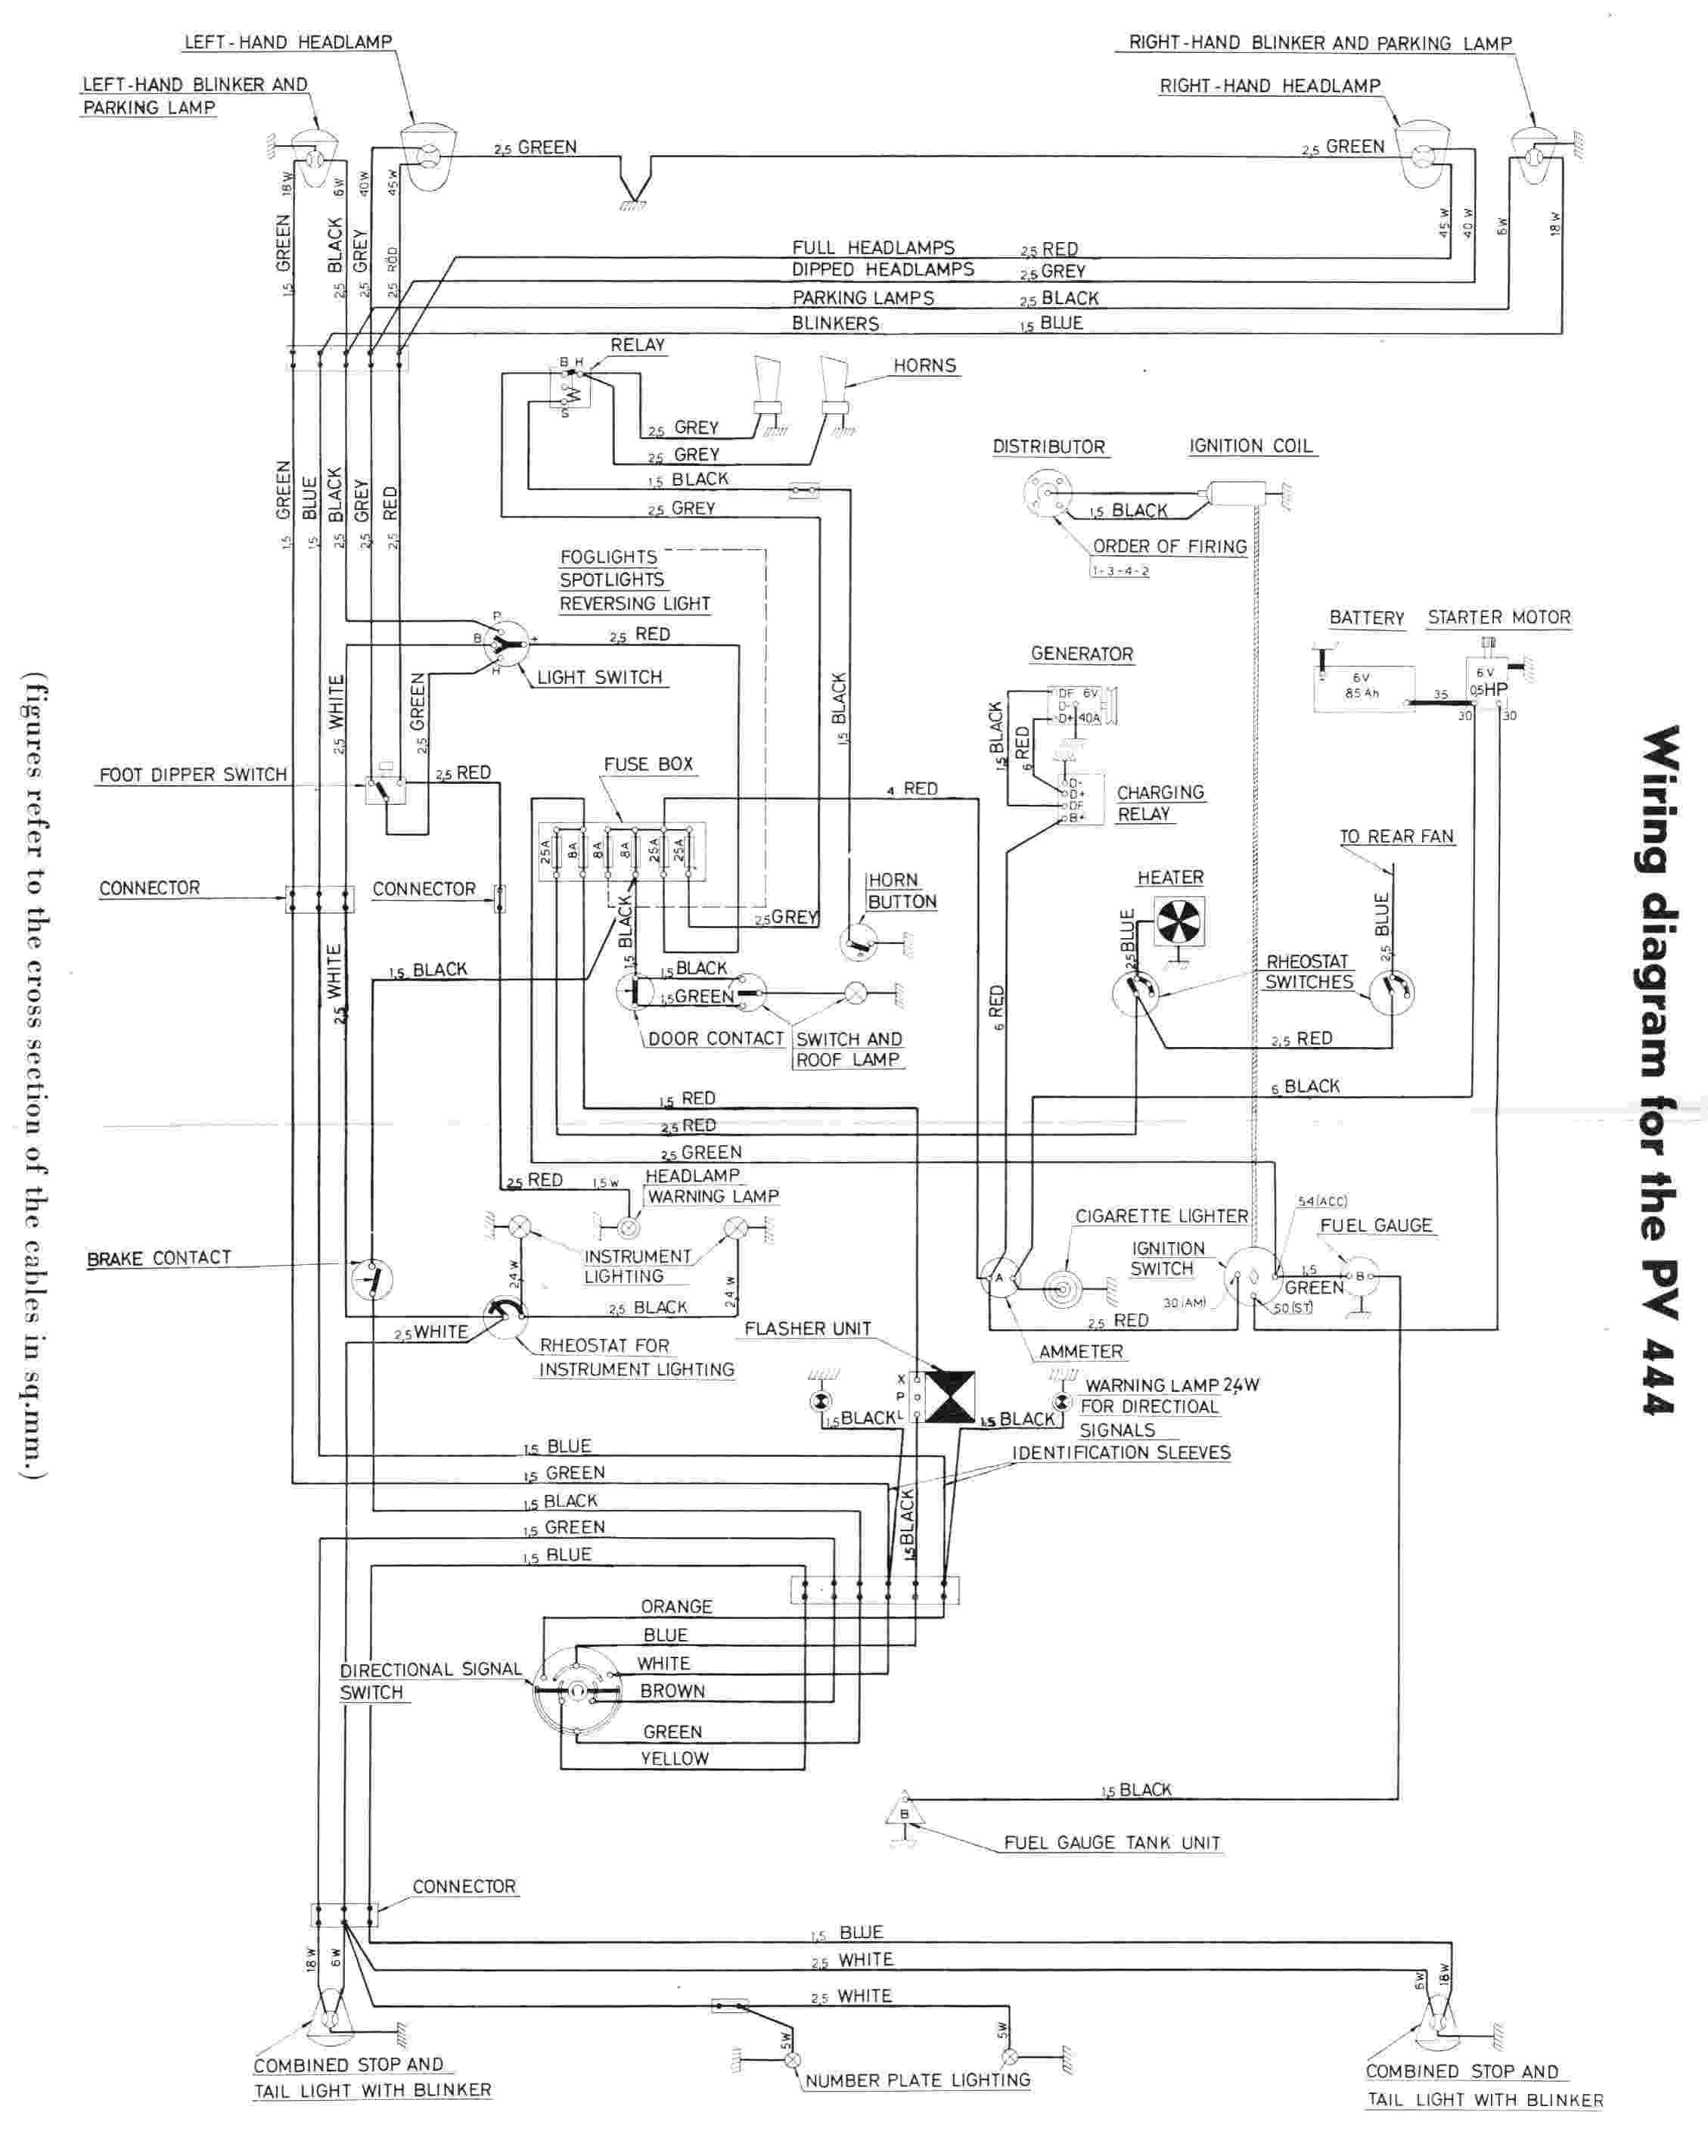 semi truck wiring diagrams wiring diagrams scematic bobcat tractor volvo semi truck dash wiring wiring diagram [ 2258 x 2850 Pixel ]